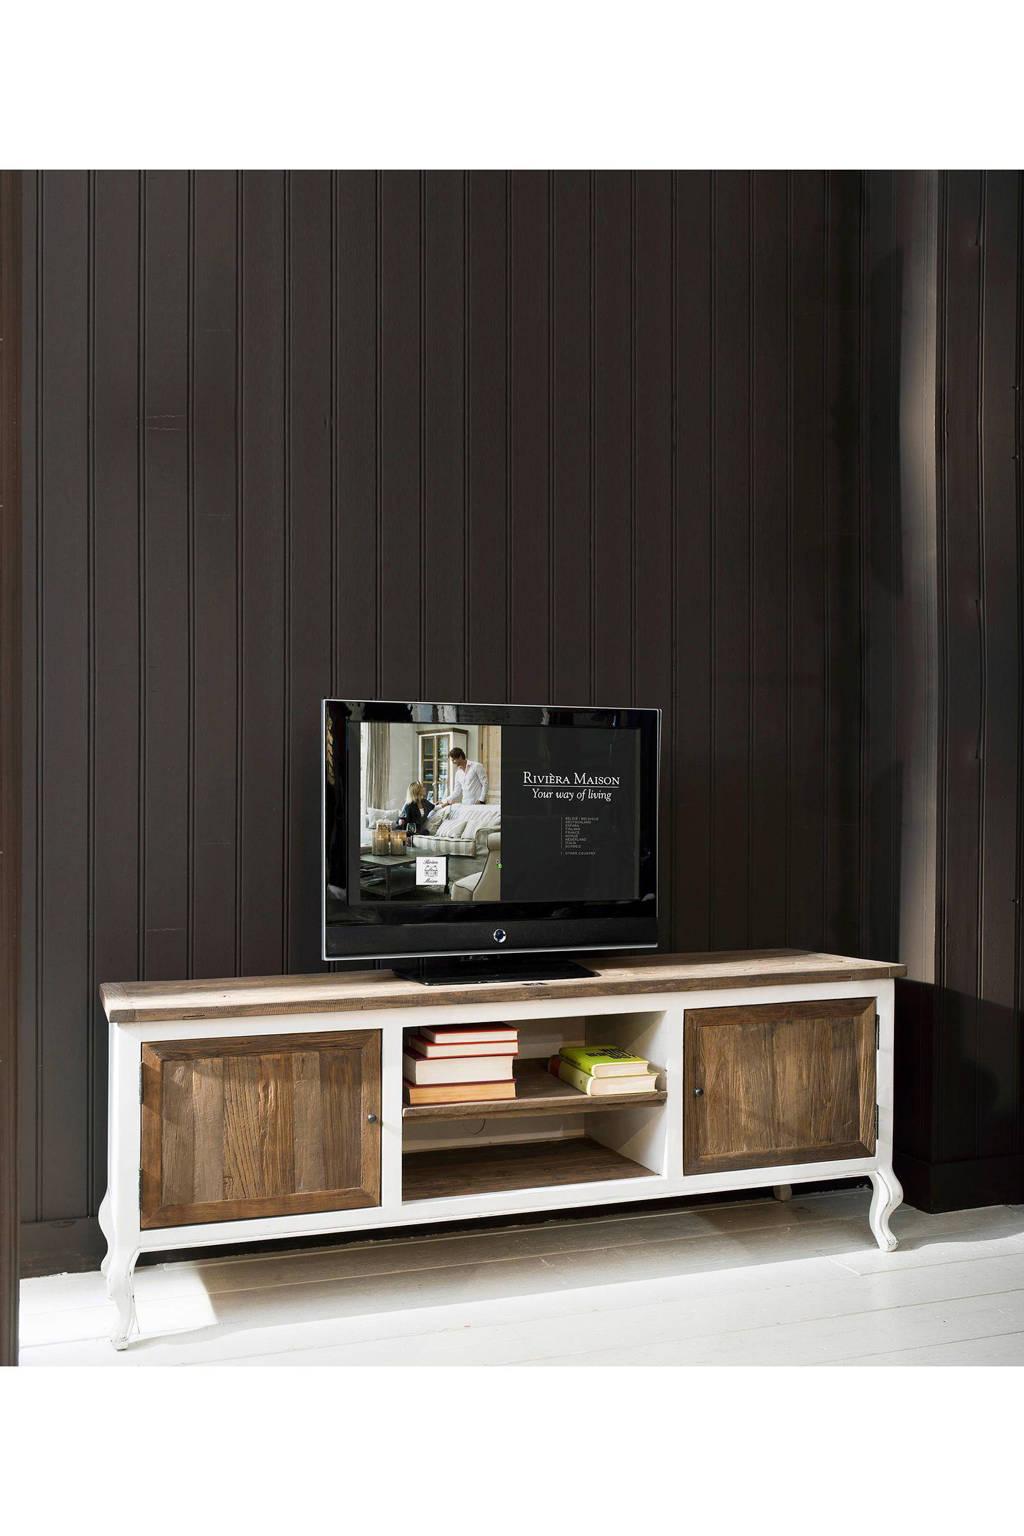 Riviera Tv Meubel.Riviera Maison Tv Meubel Driftwood Flatscreen Wehkamp